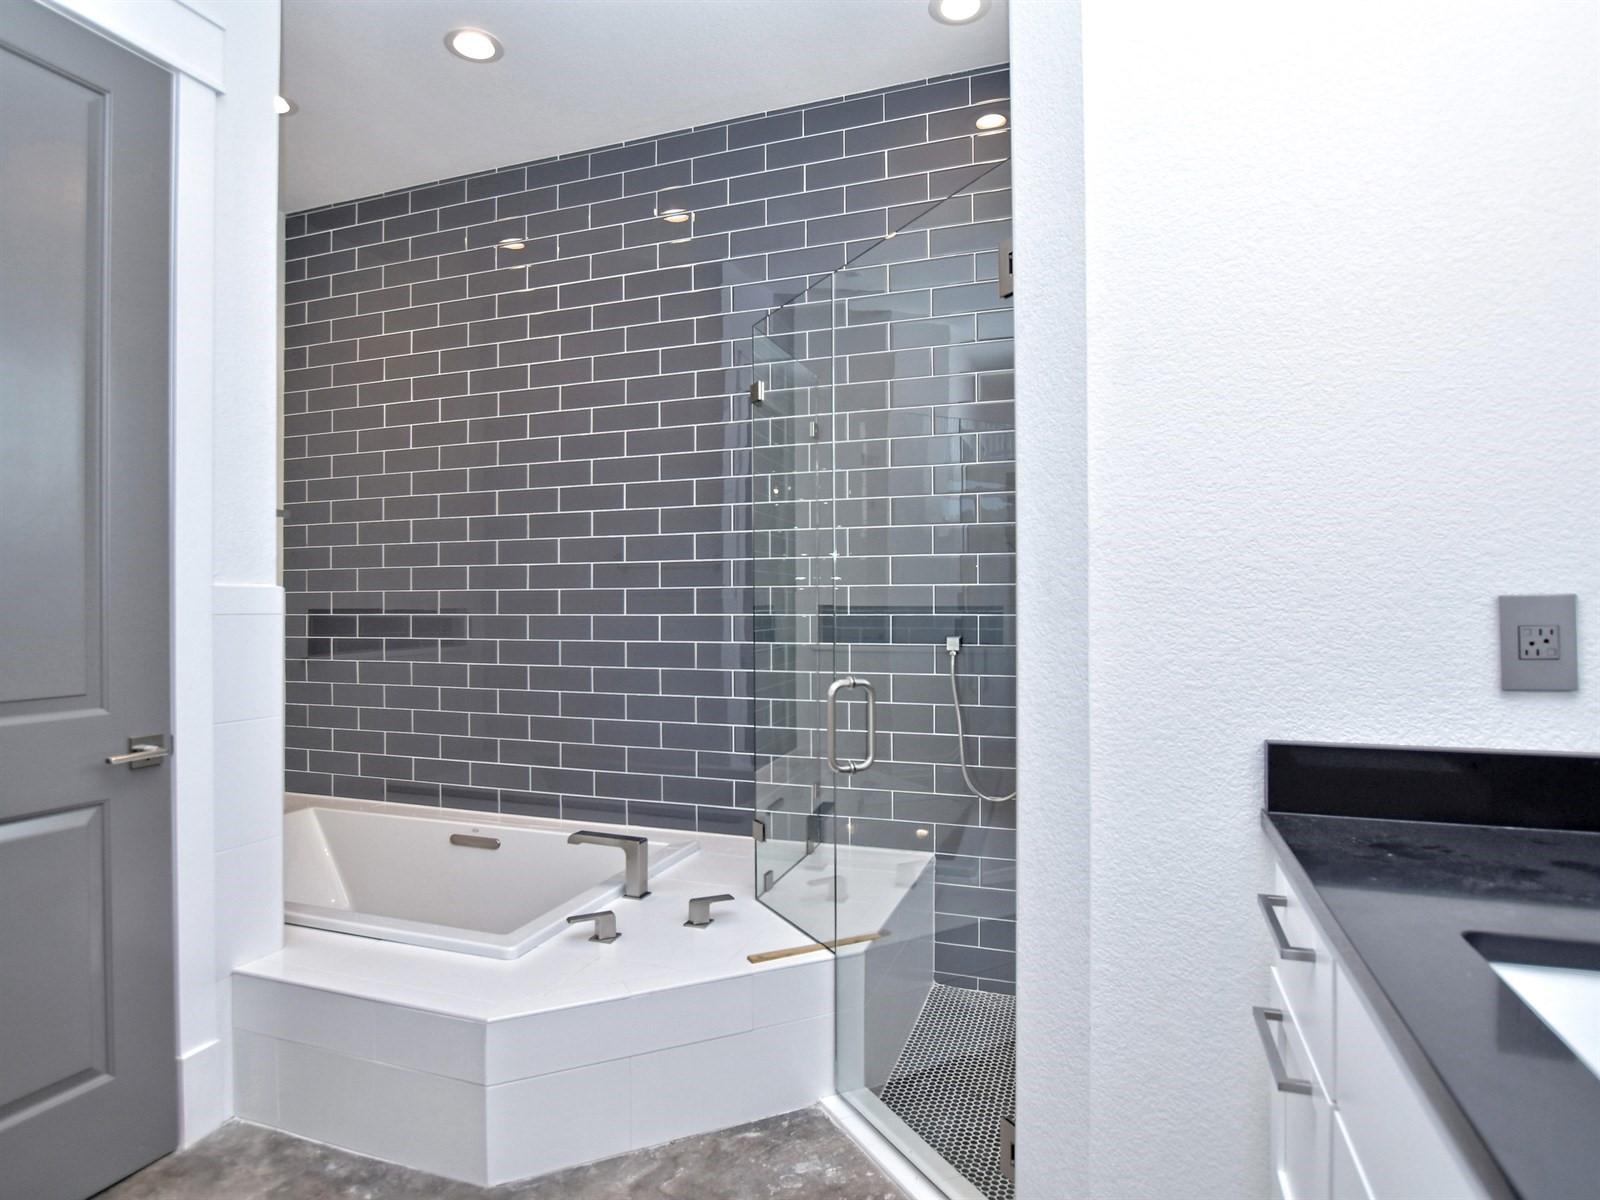 022_Master Bathroom 2.jpg